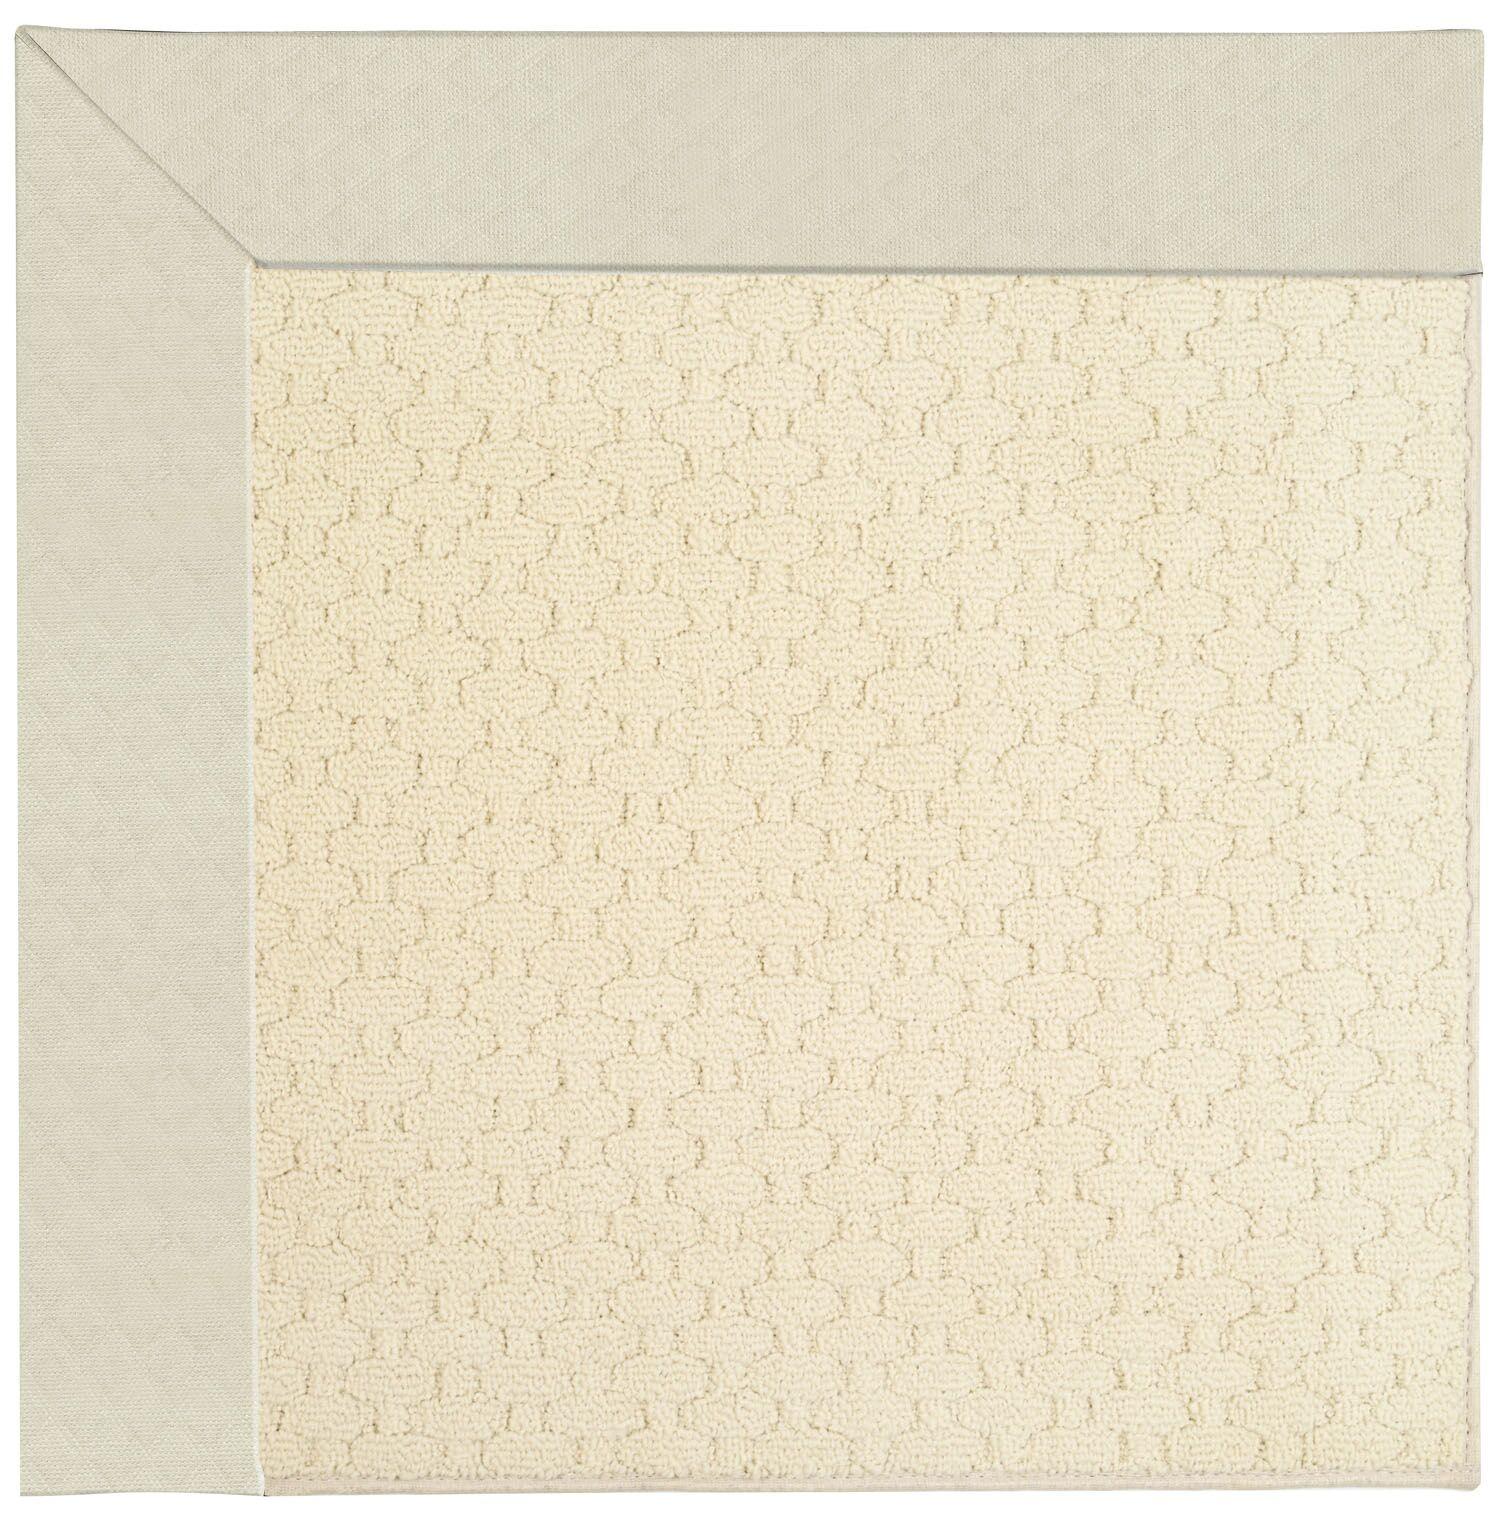 Lisle Cream Indoor/Outdoor Area Rug Rug Size: Square 4'